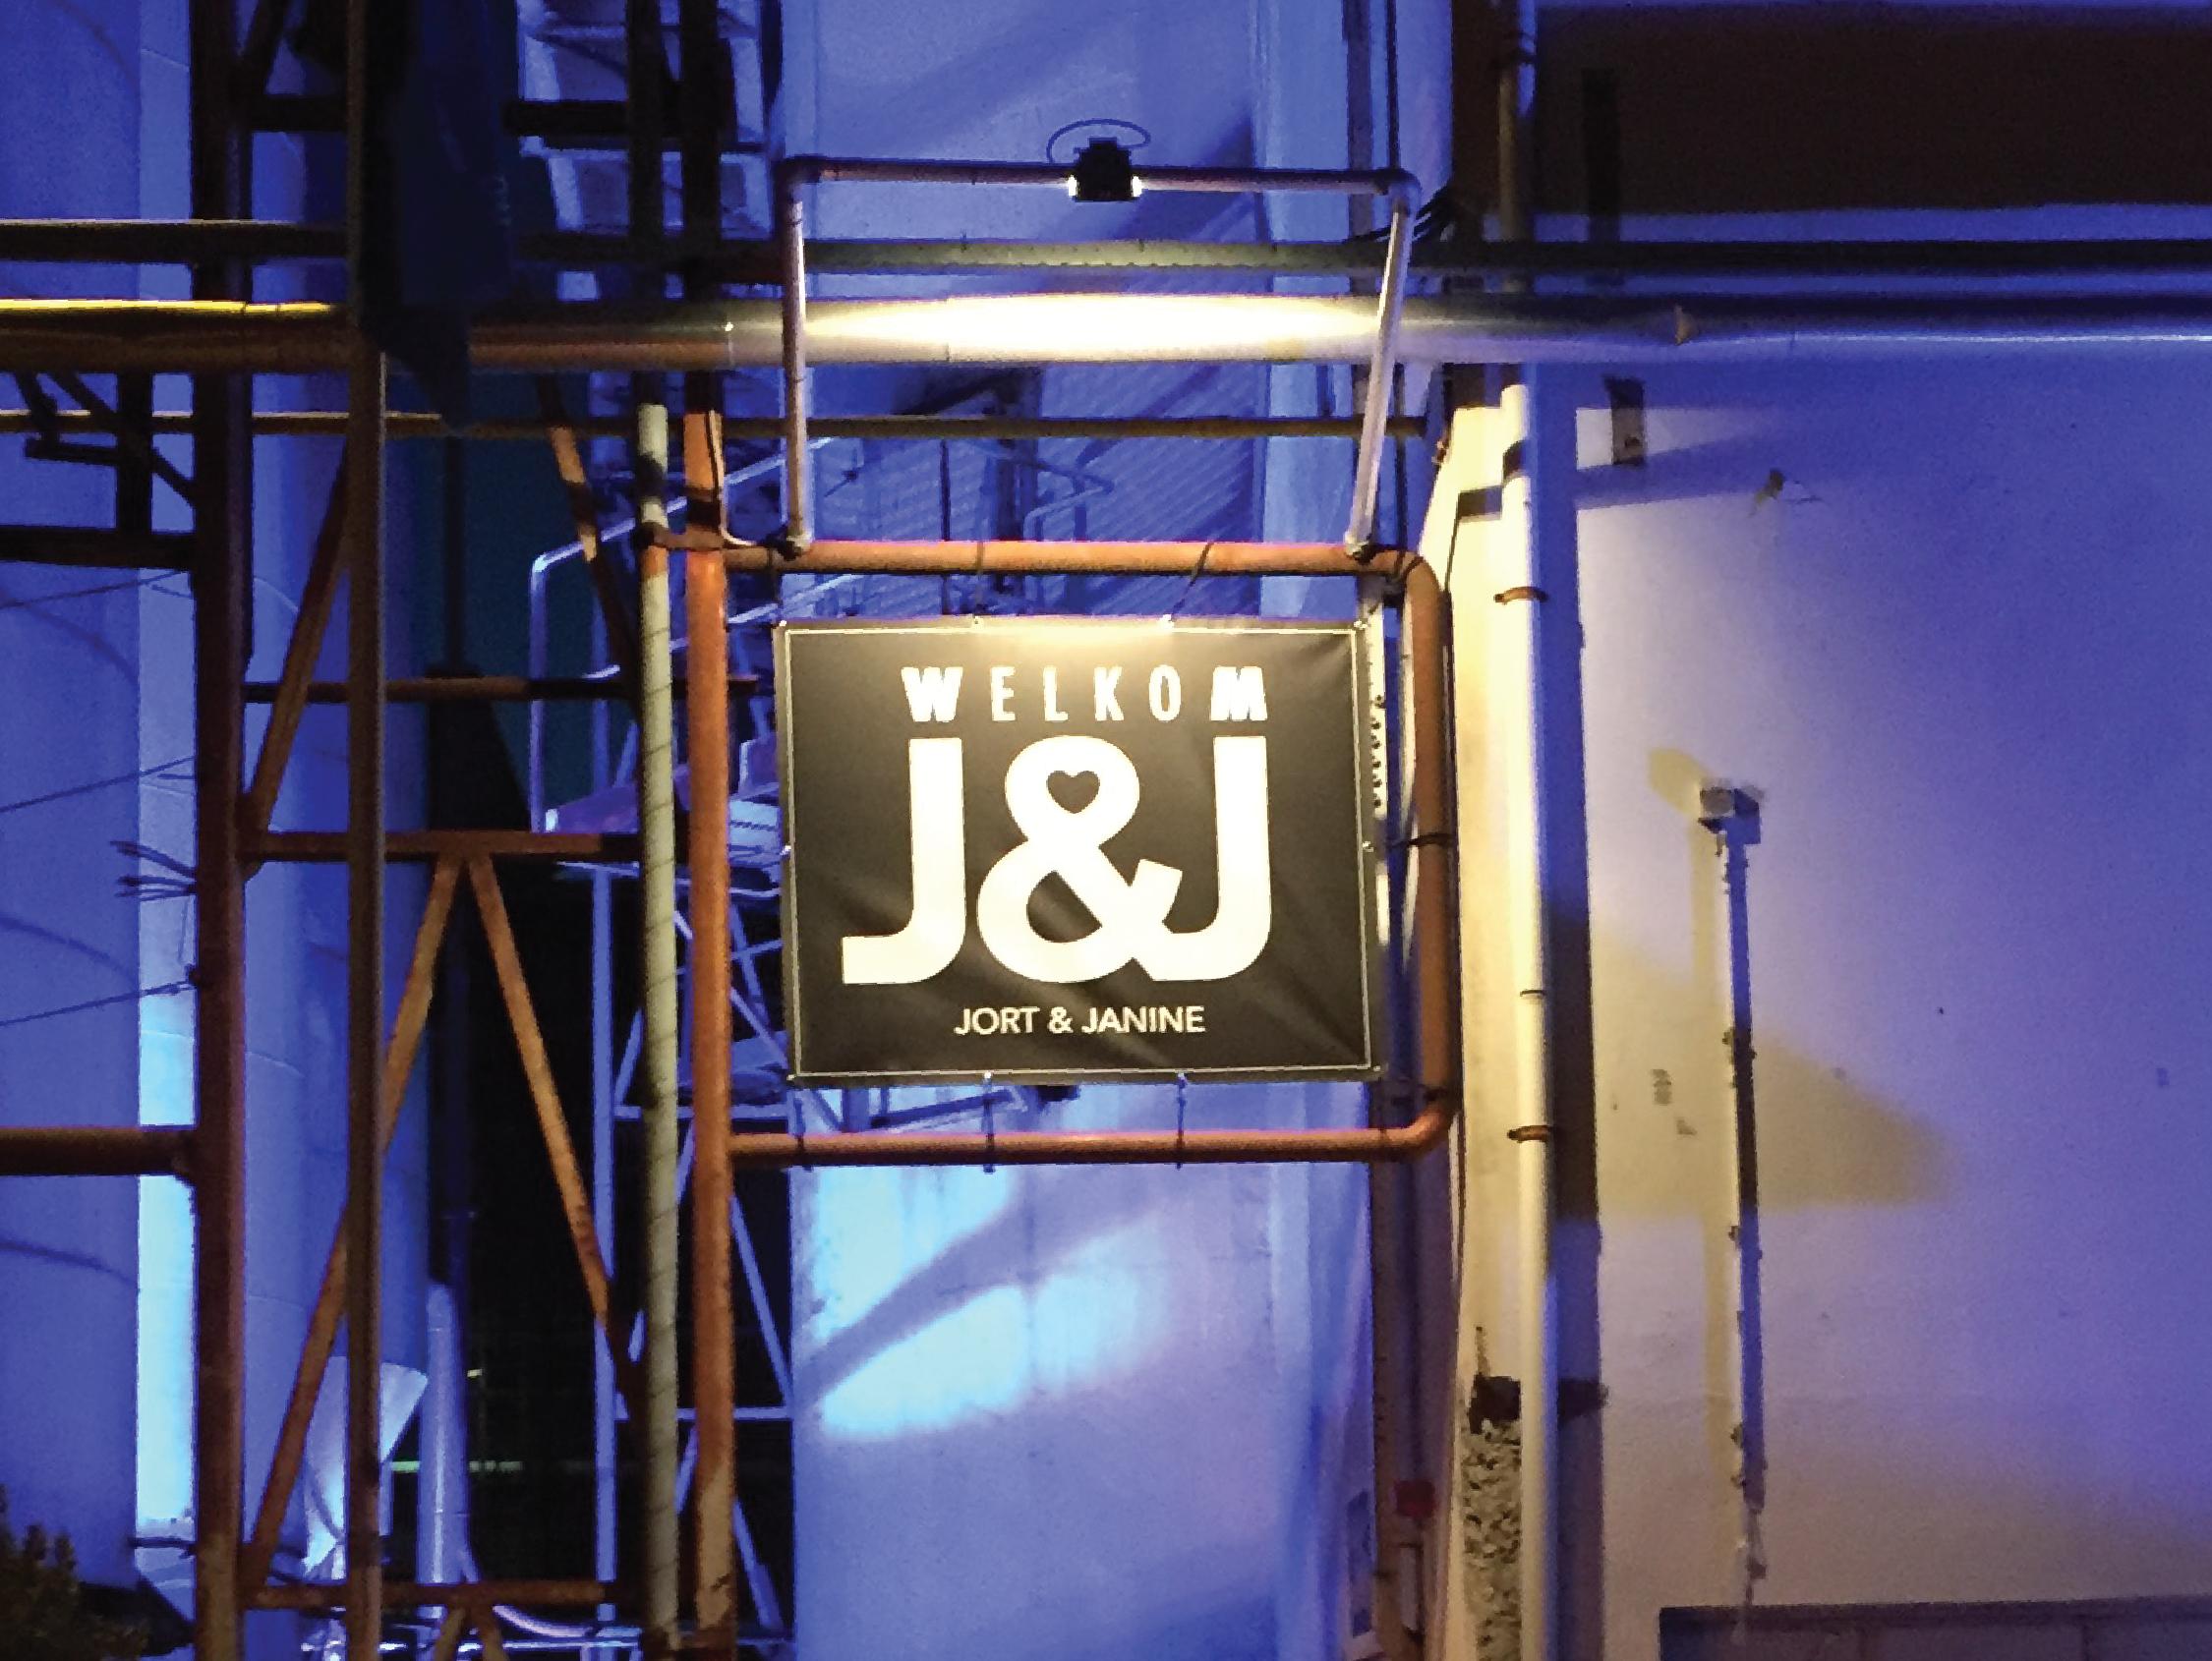 Jort_&_Janine_XAdesign_Xander_Abbink_trouwkaart-banner-intree